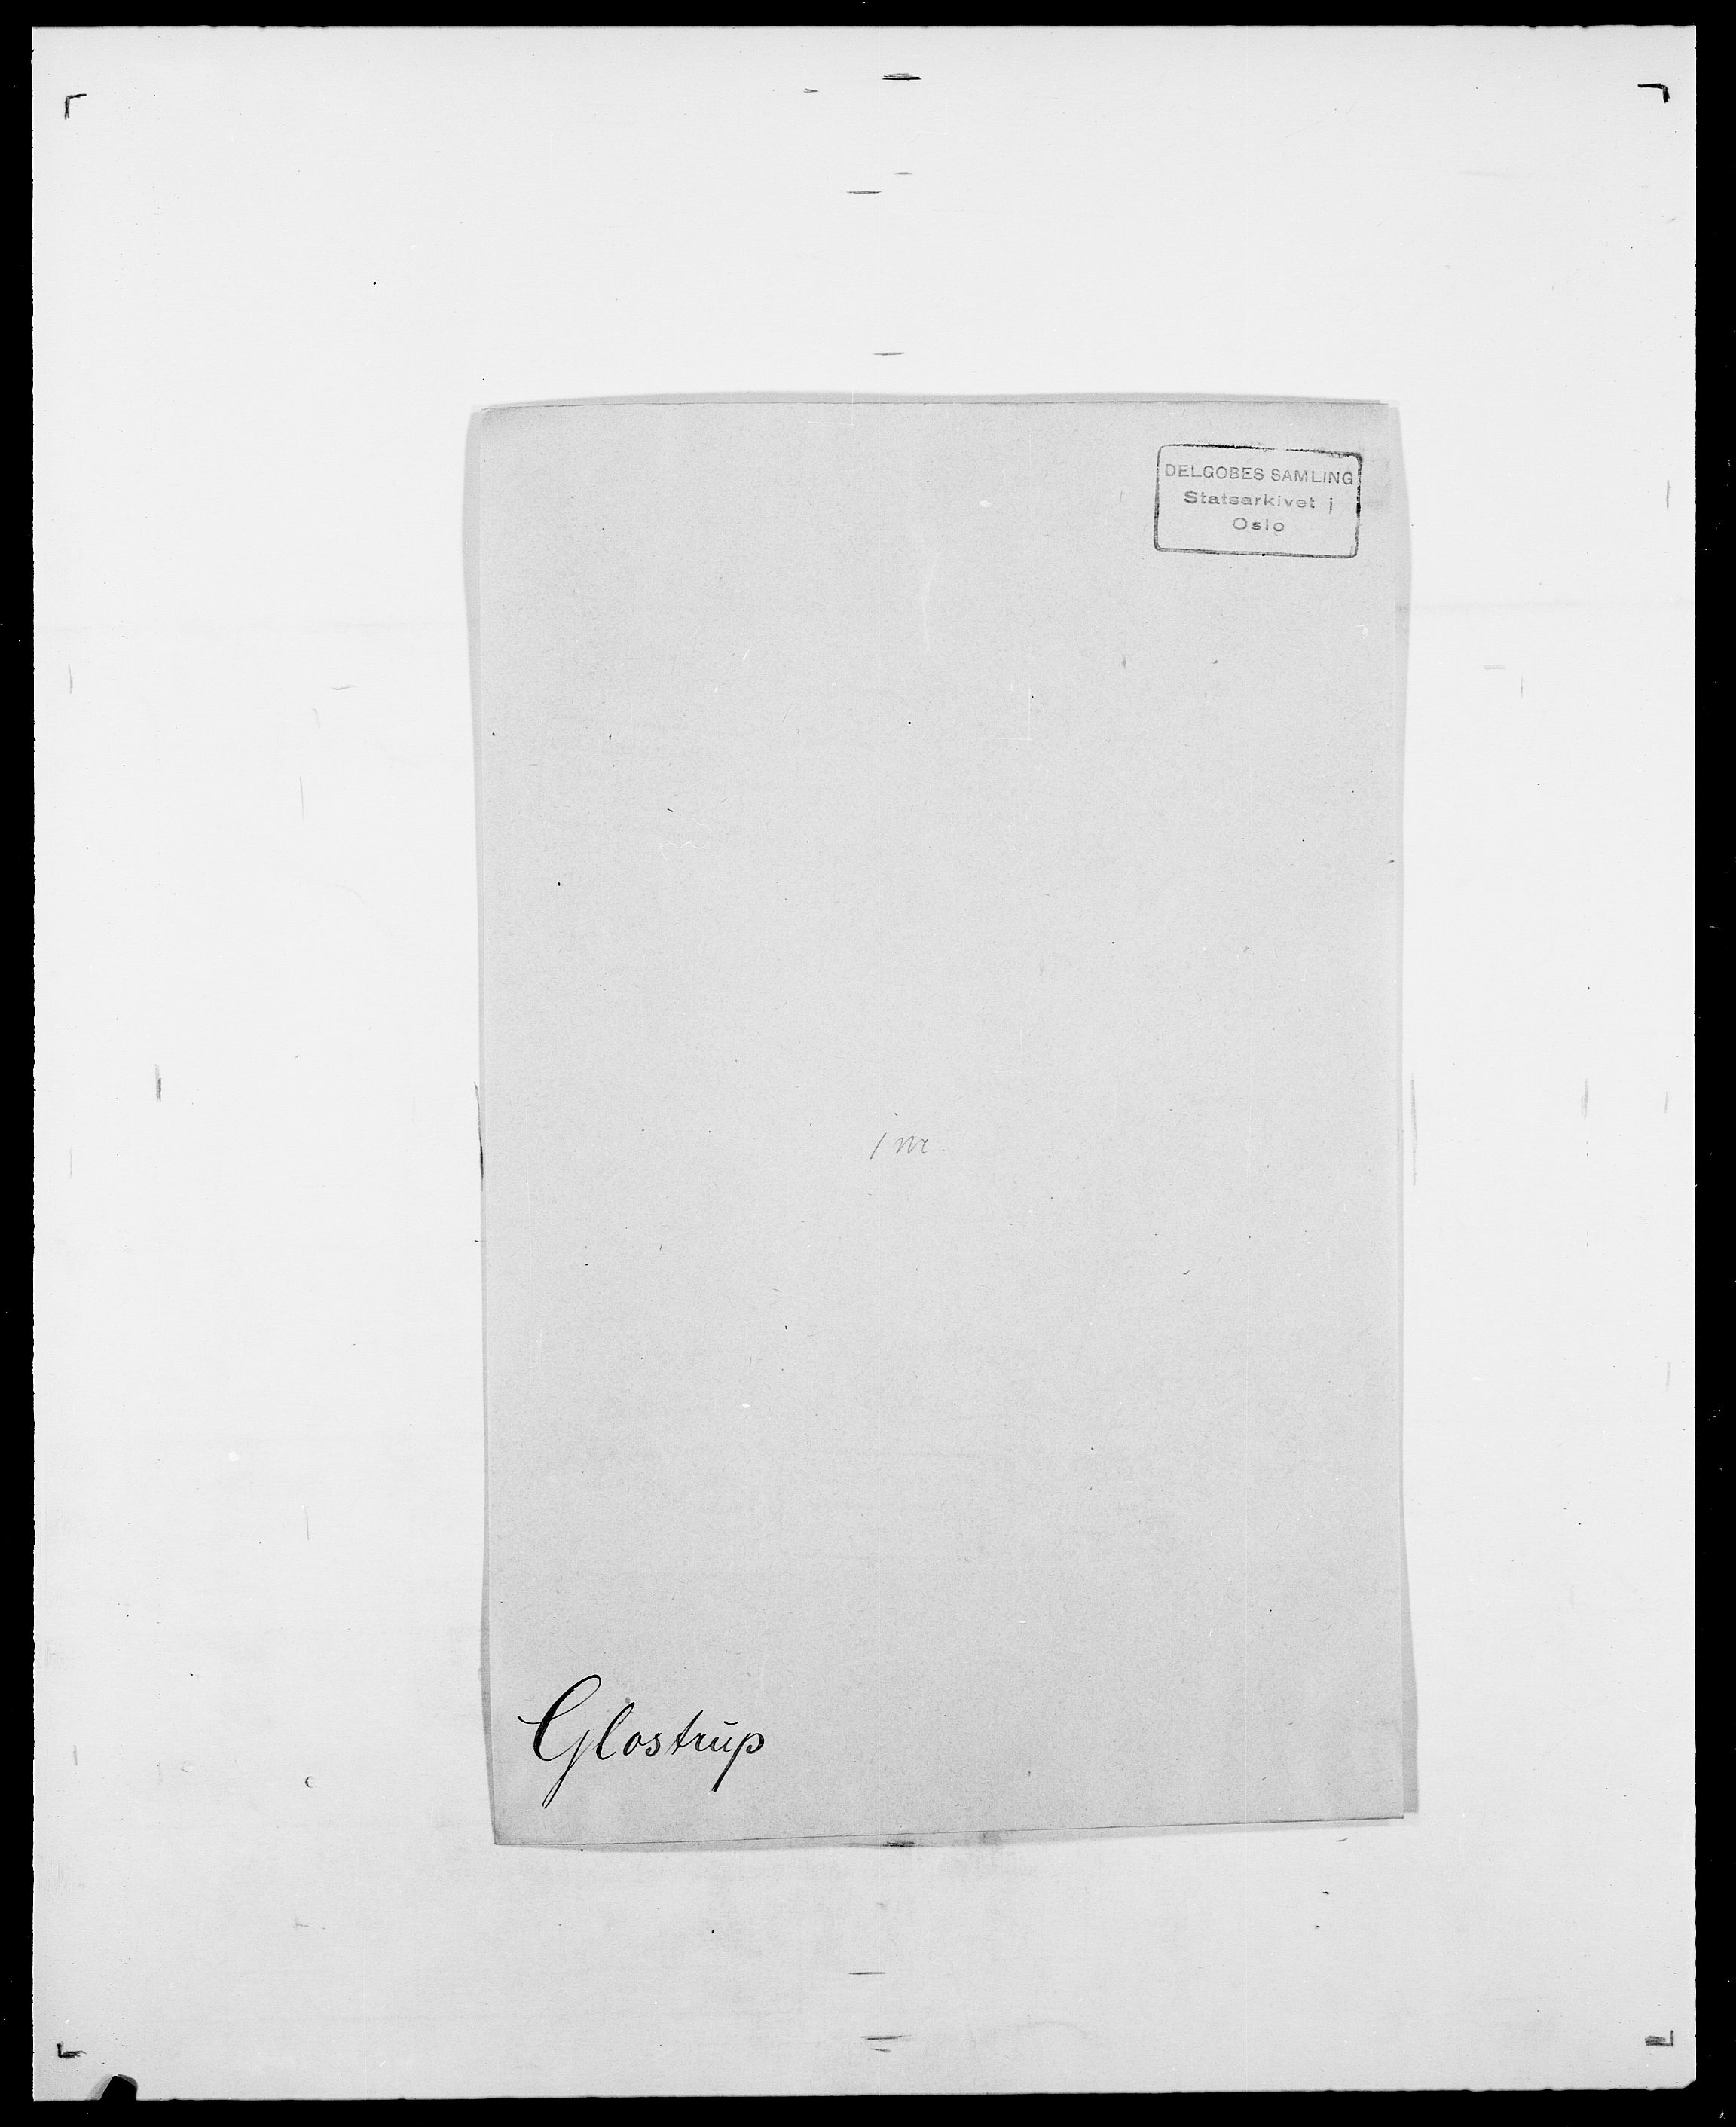 SAO, Delgobe, Charles Antoine - samling, D/Da/L0014: Giebdhausen - Grip, s. 333